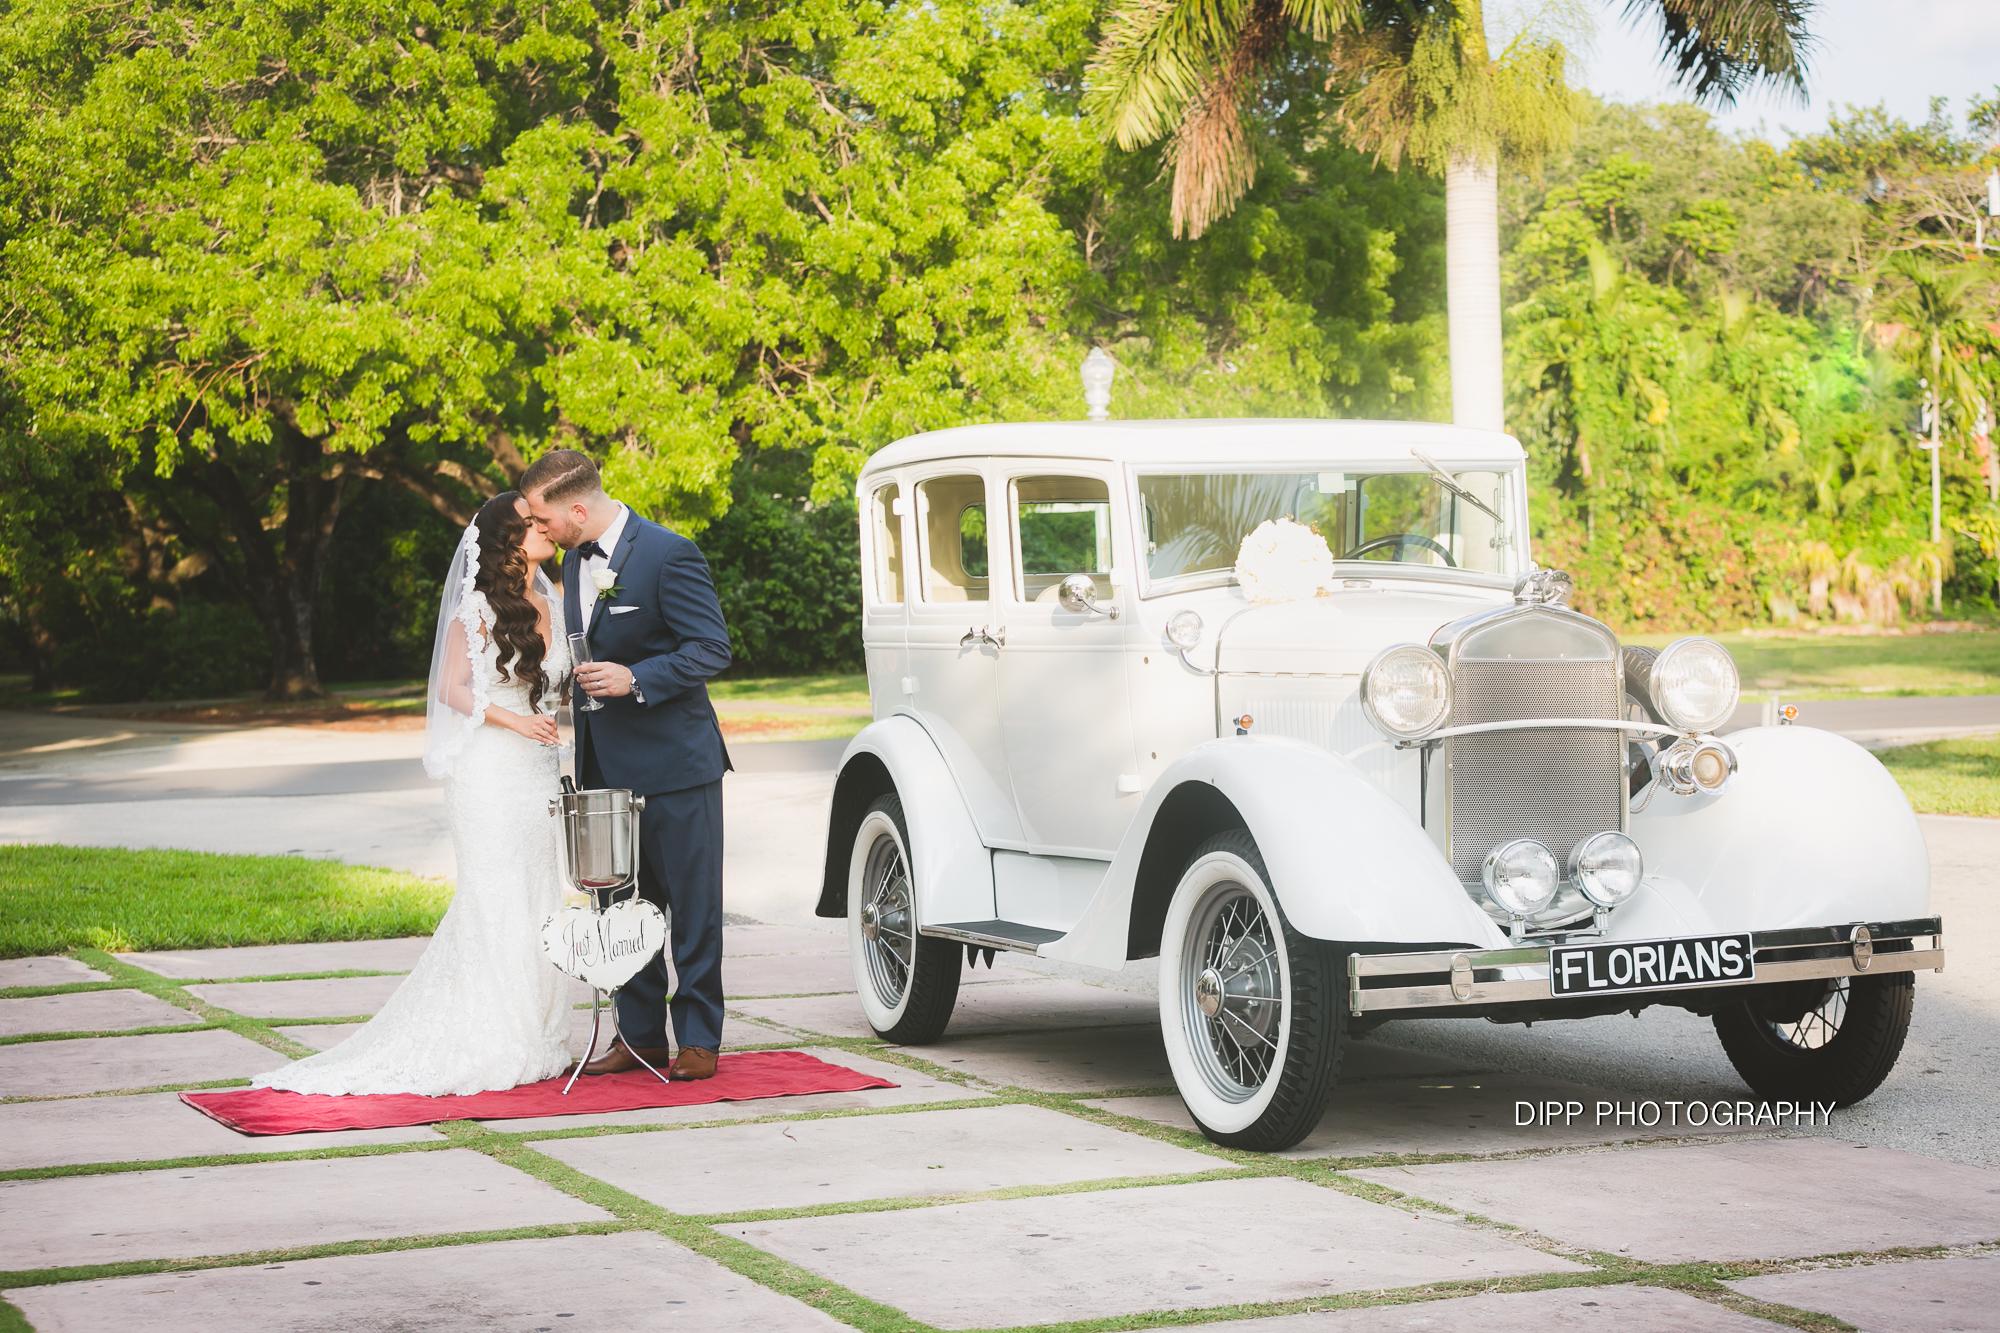 Dipp_2016 EDITED Melissa & Avilio Wedding-304